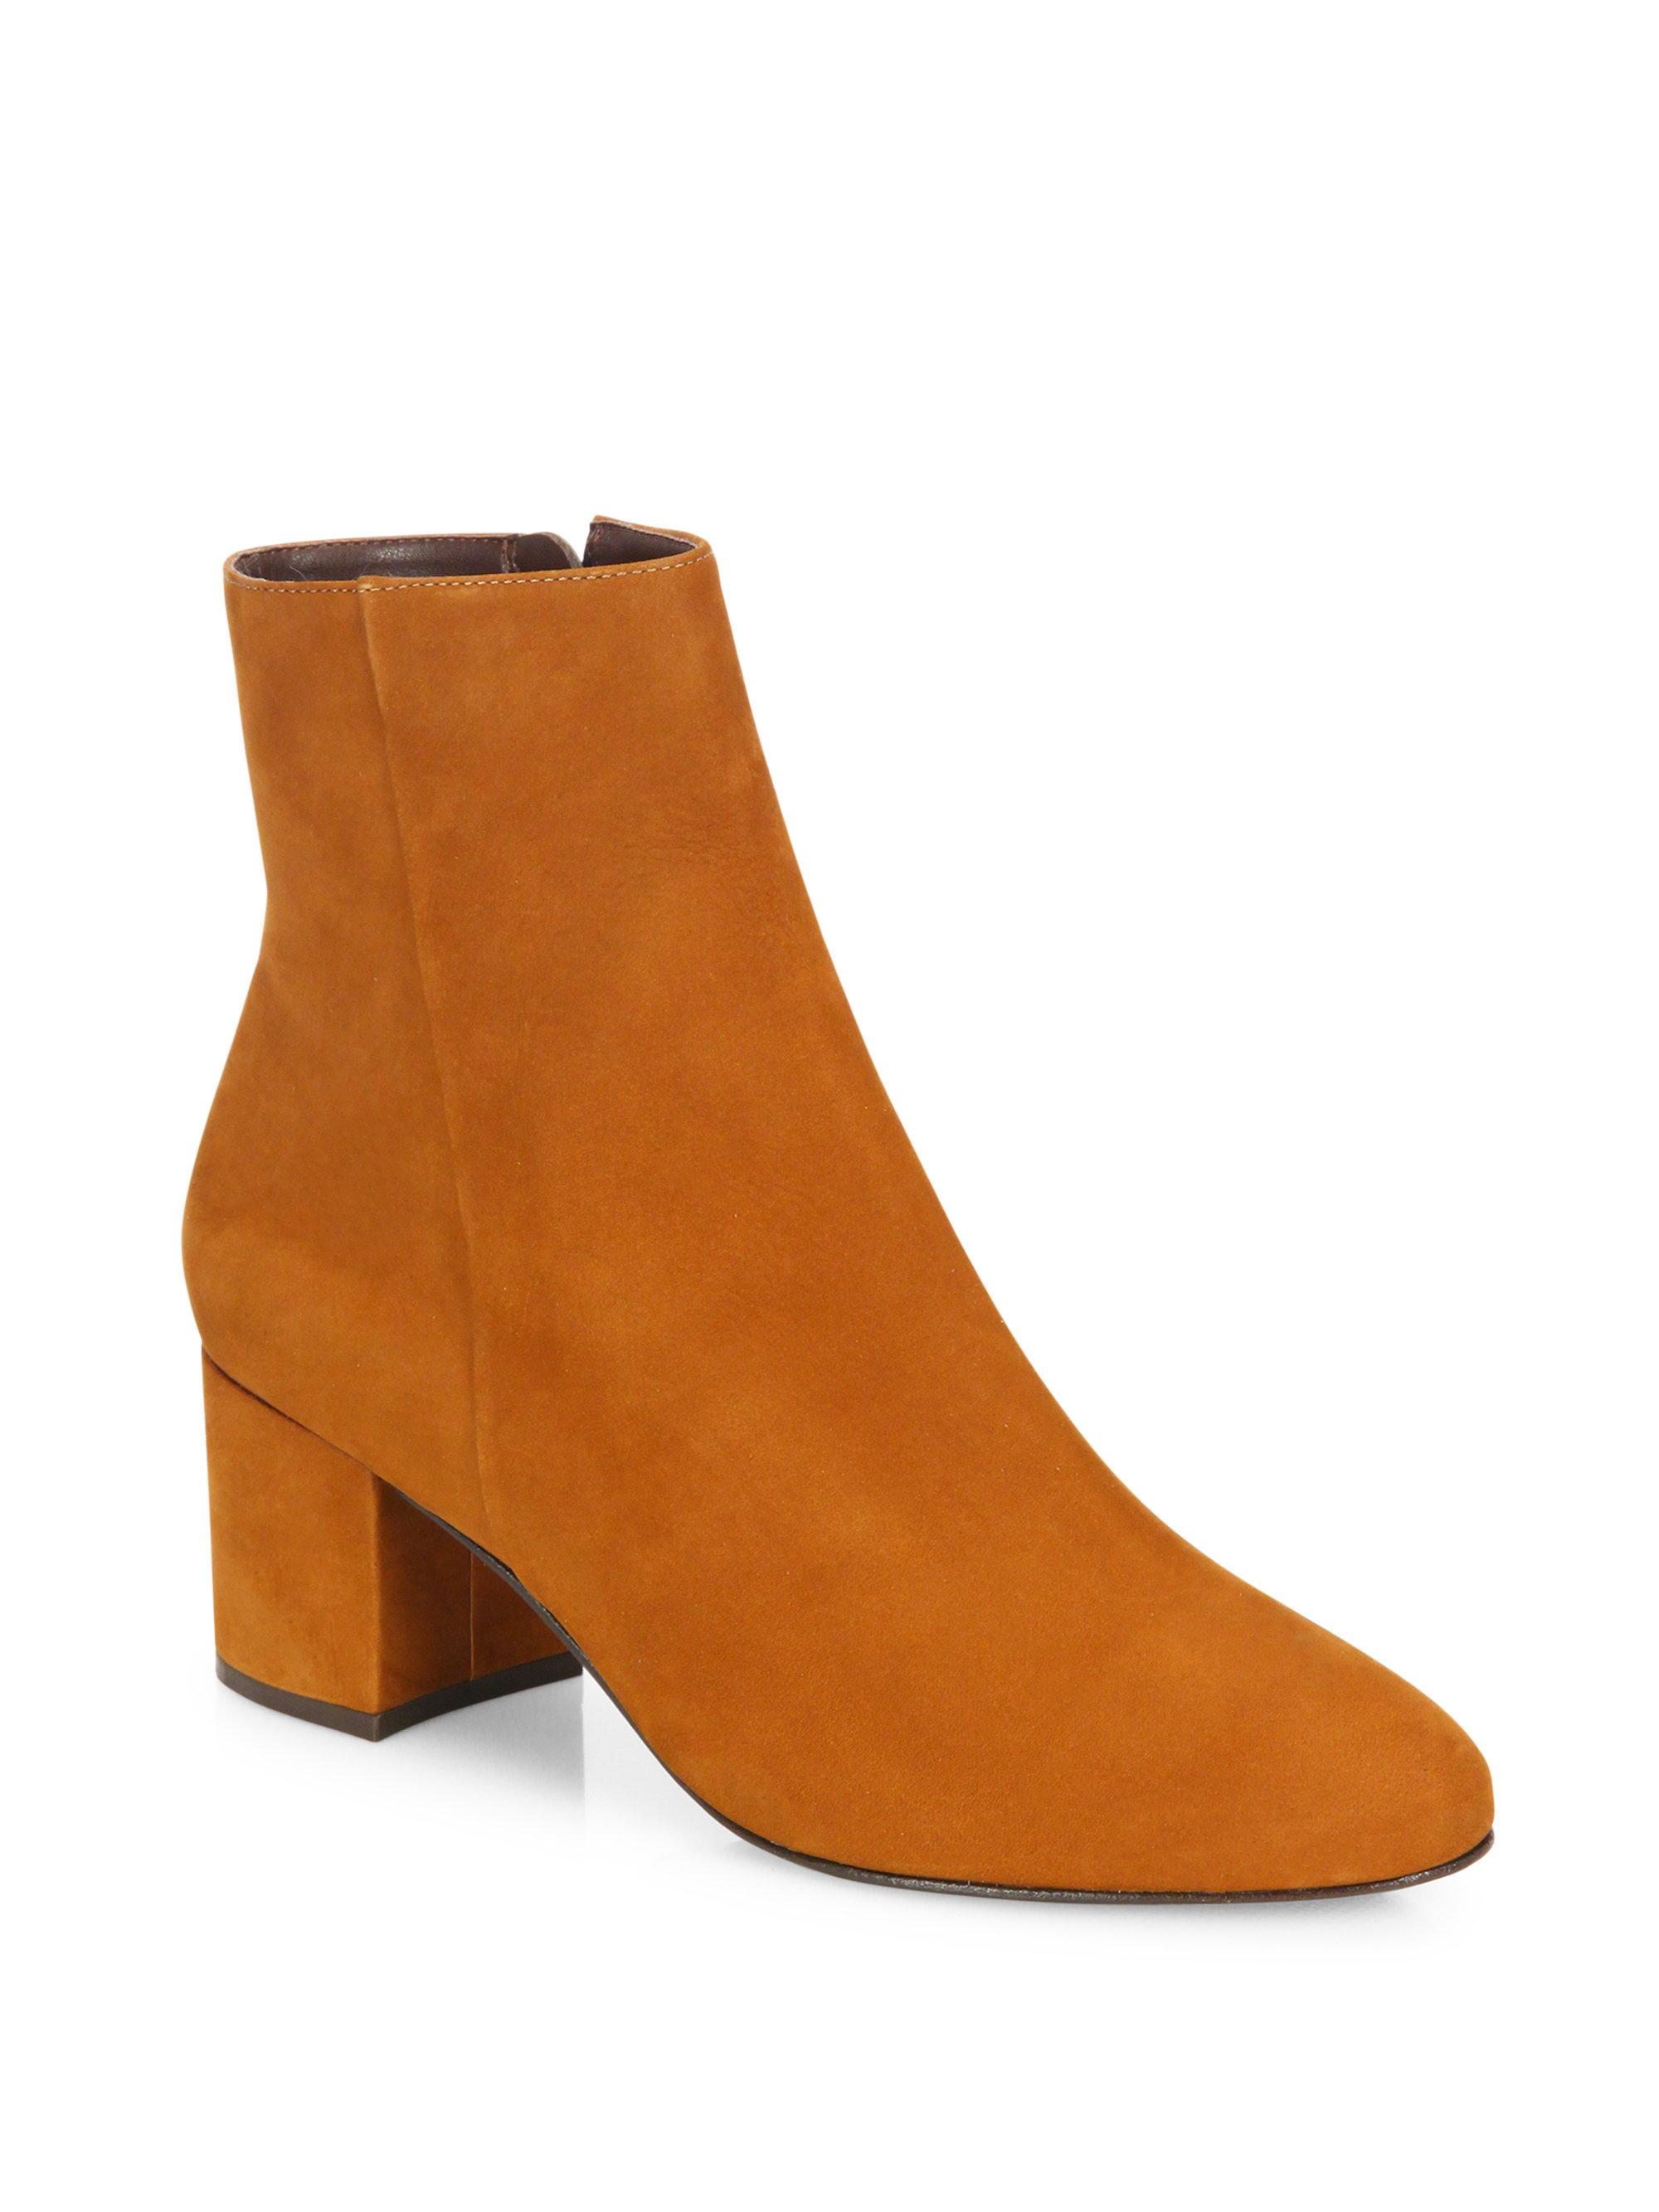 schutz suede ankle boots in brown lyst